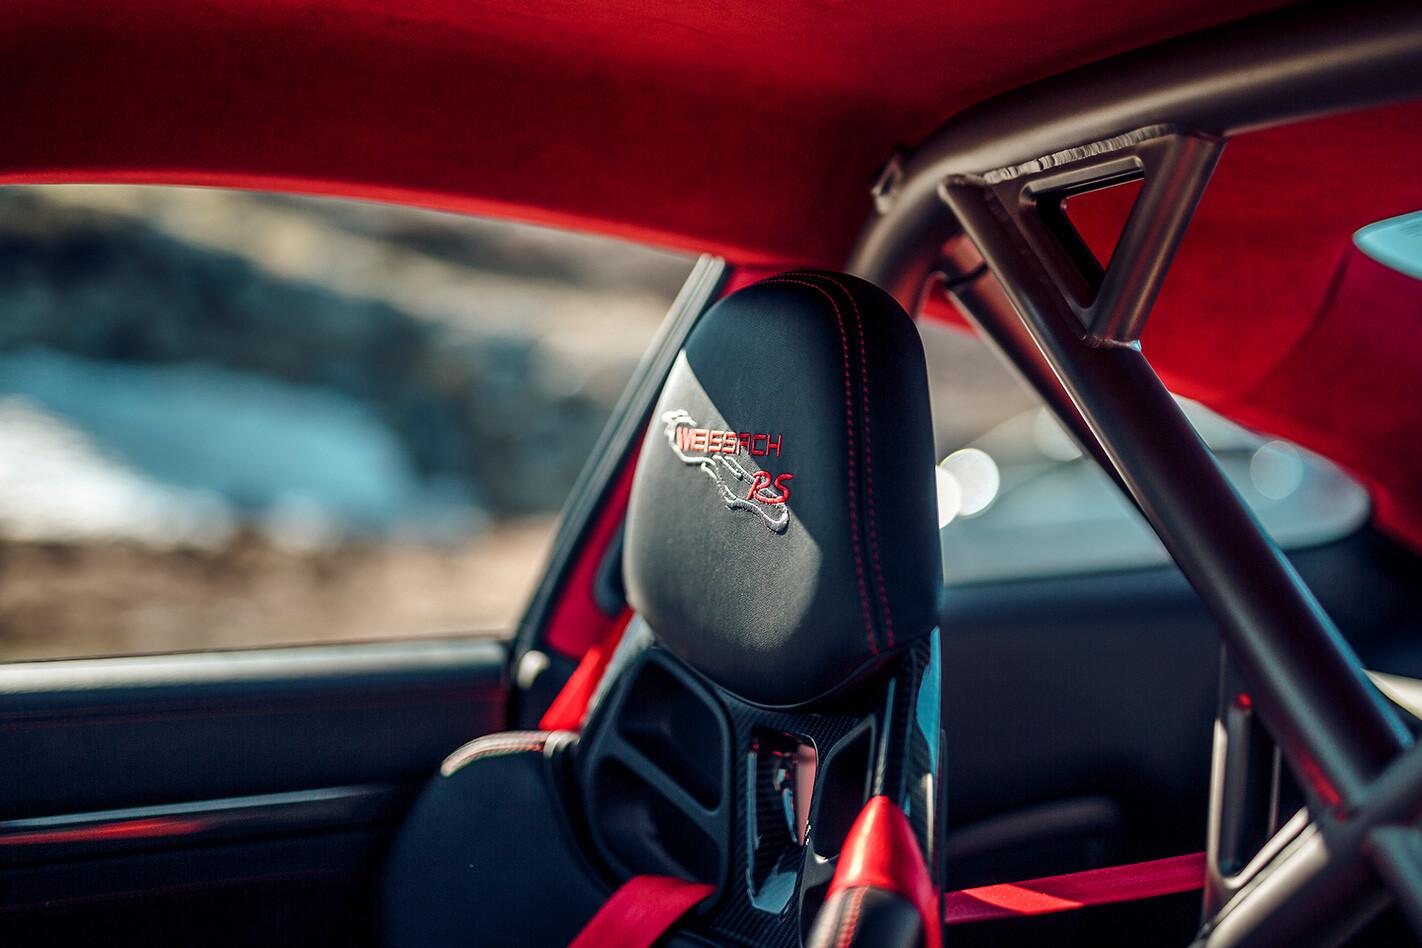 Porsche Gt 2 Rs Seat Jpg